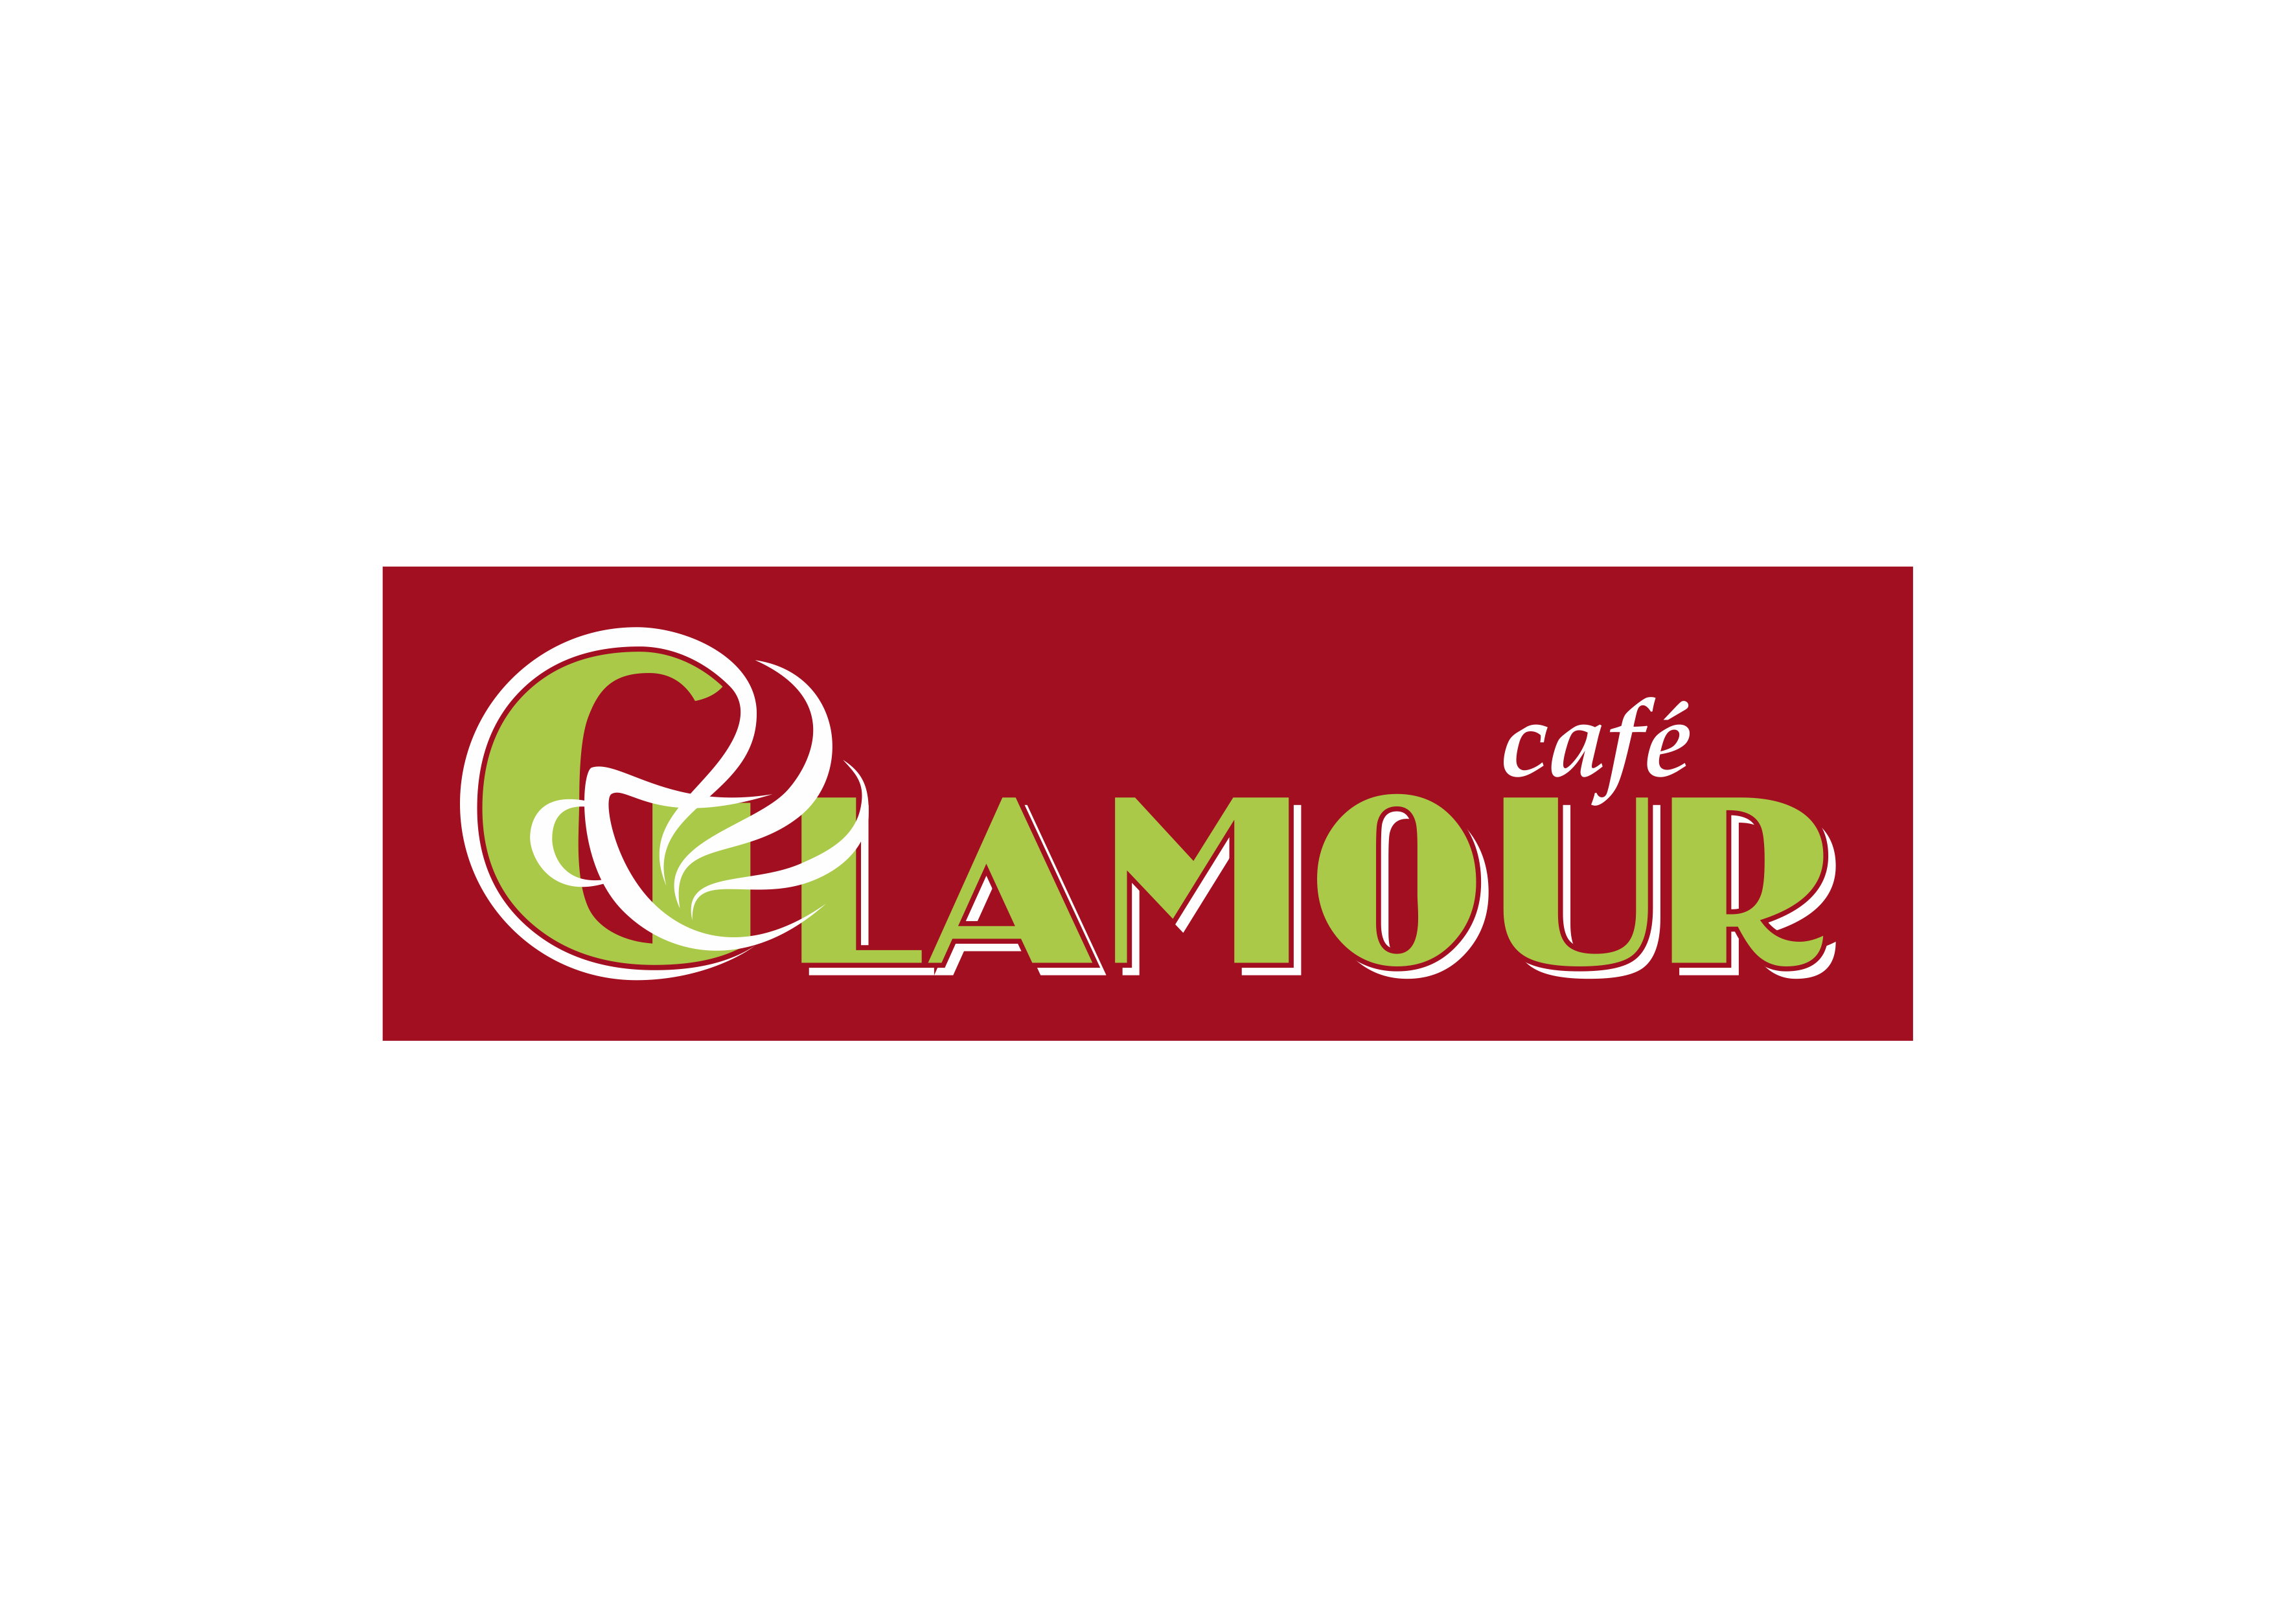 glamour-cafe